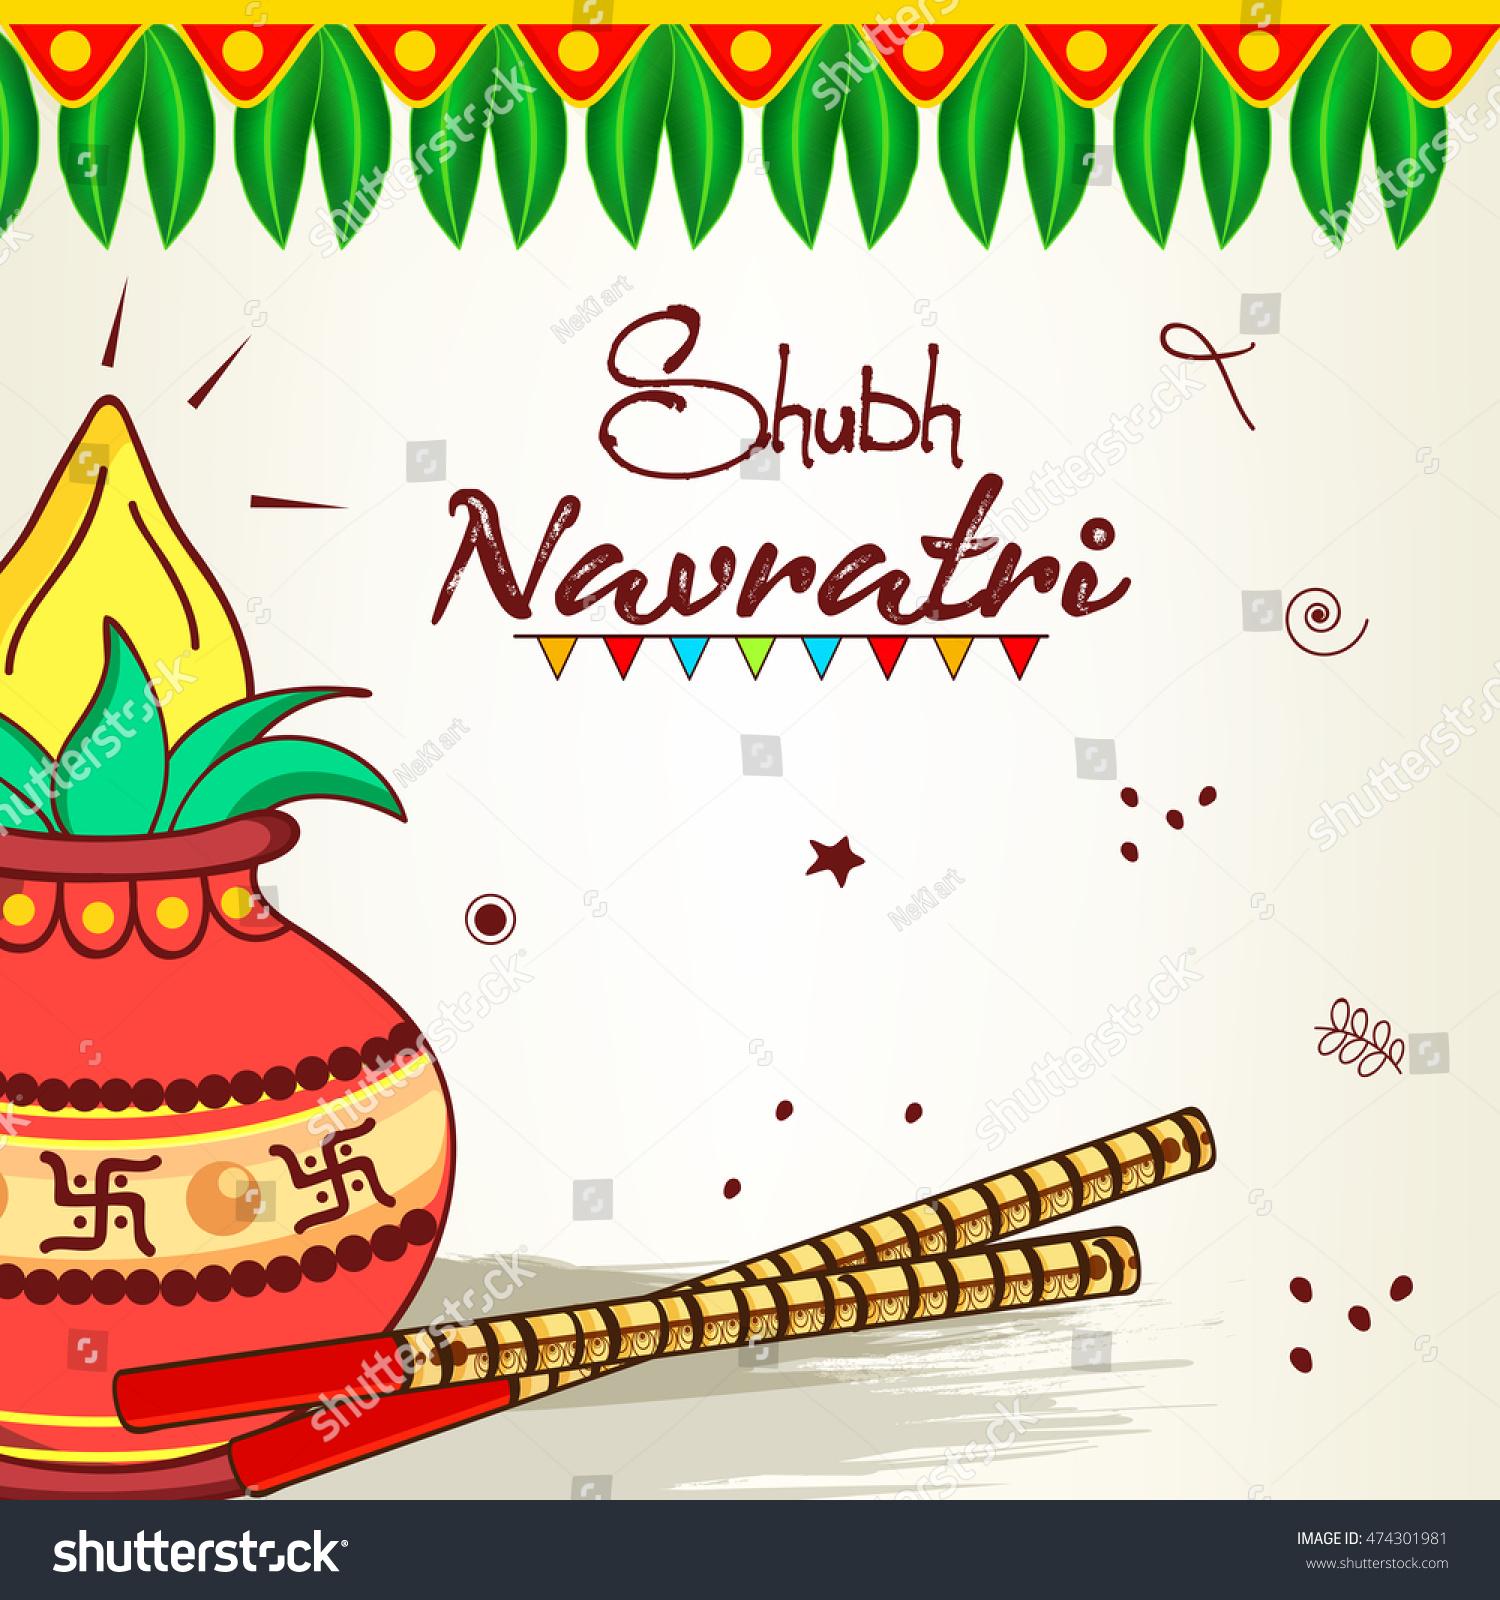 Wallpaper download navratri - Greeting Card Wallpaper Design On Occassion Stock Vector